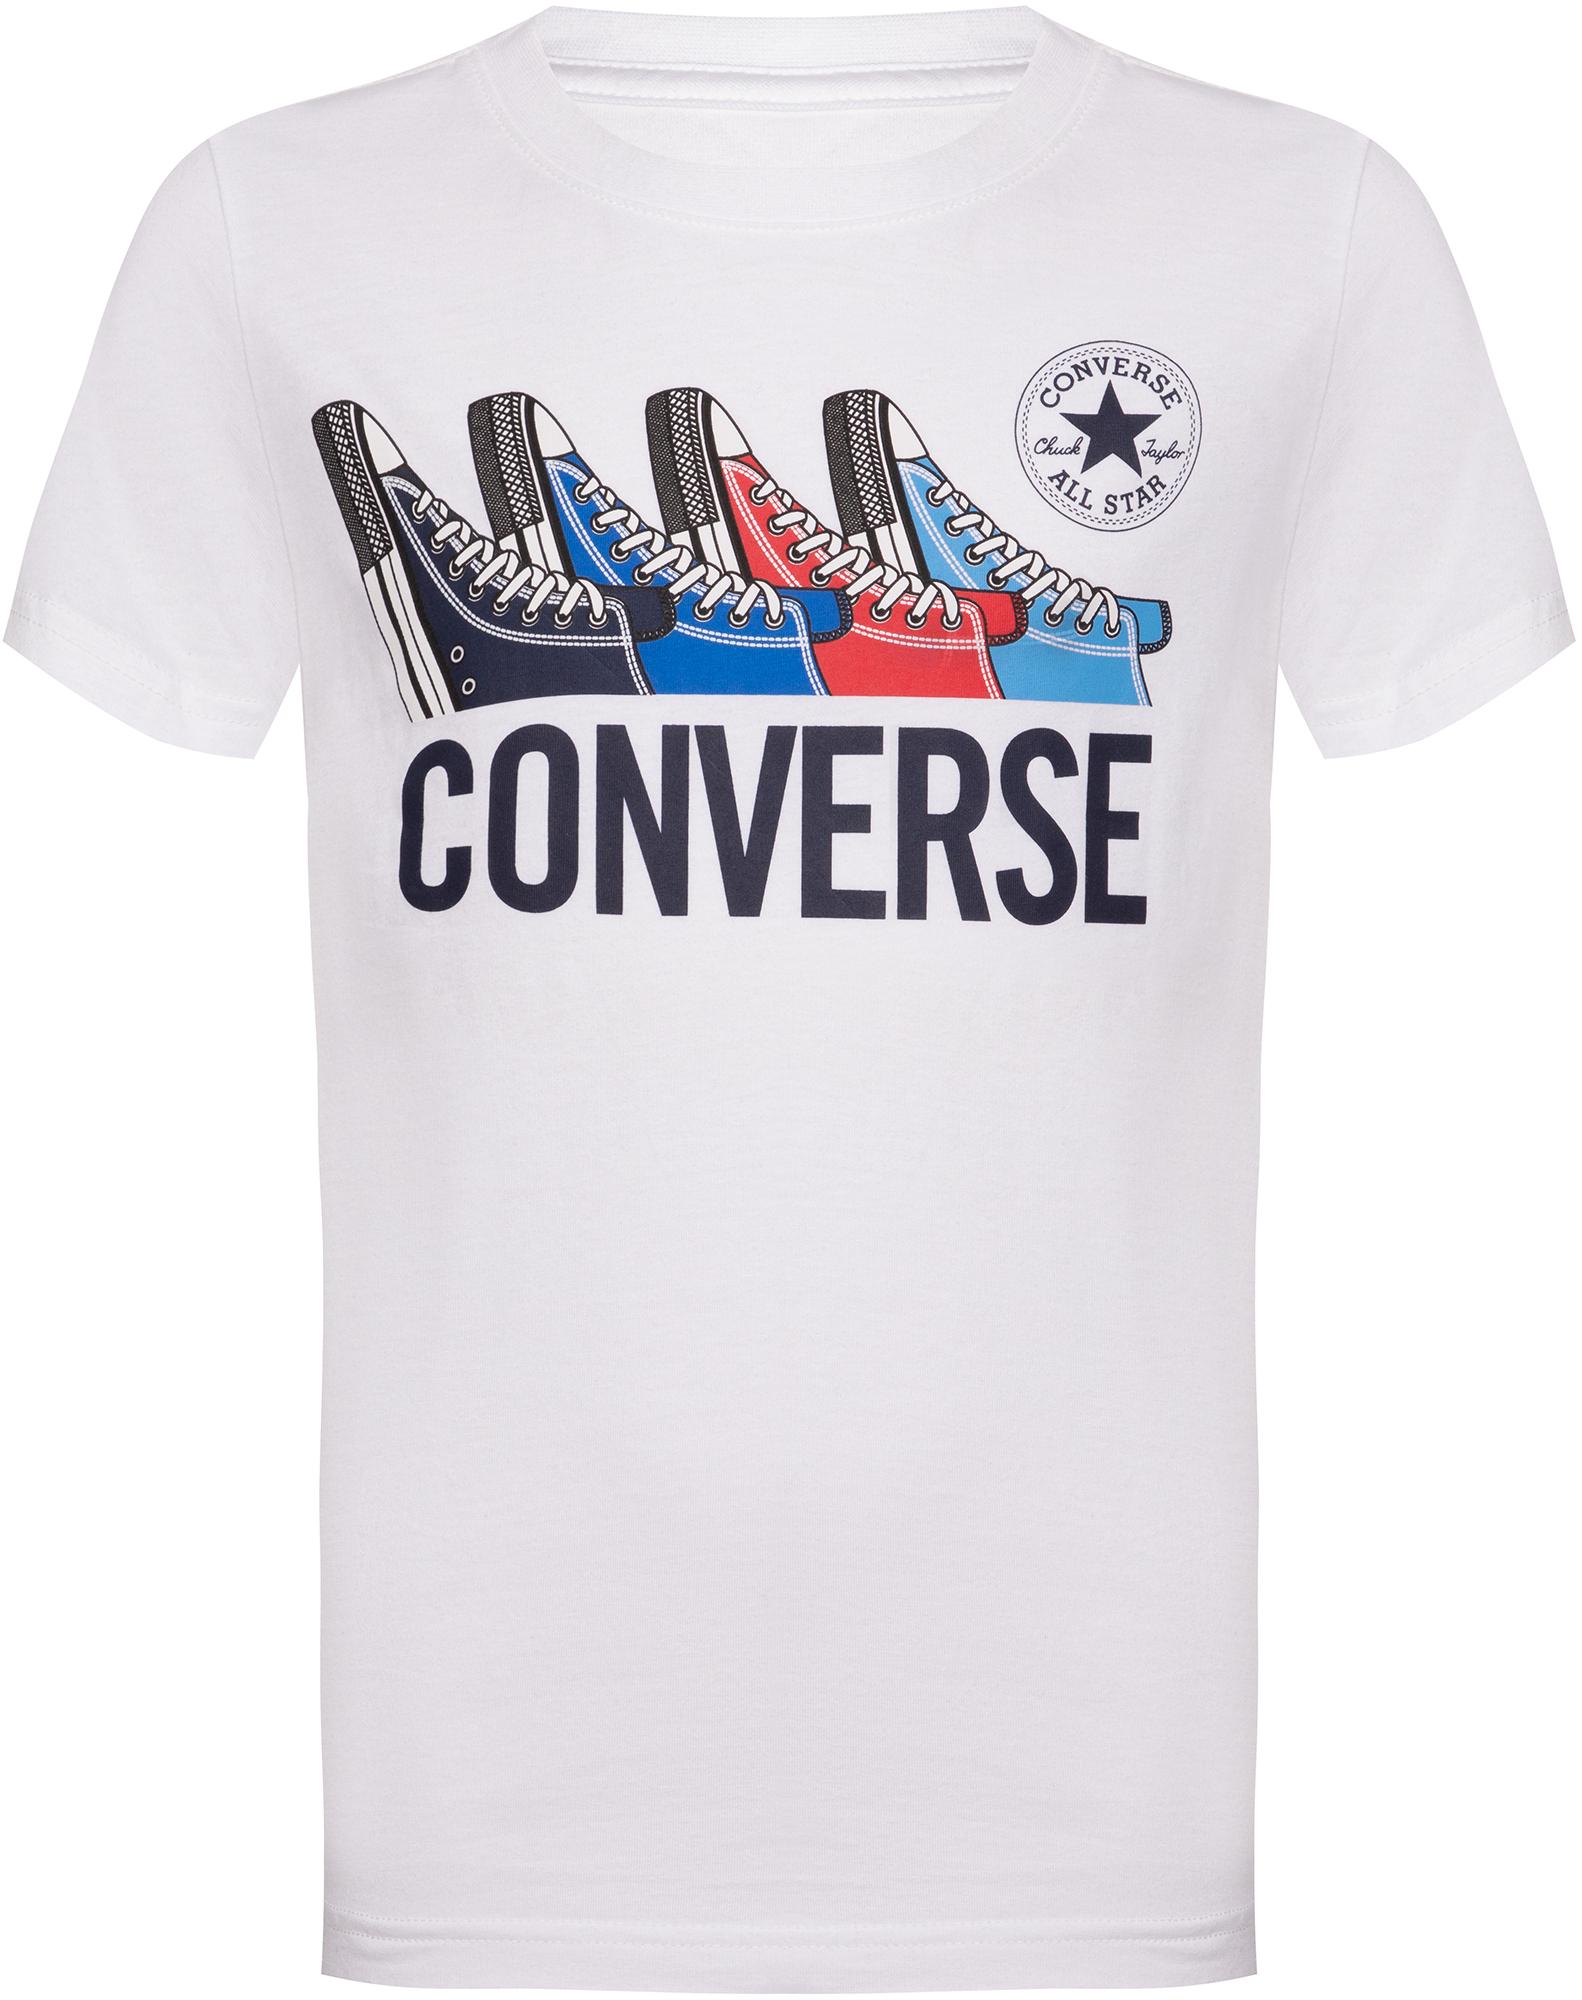 Фото - Converse Футболка для мальчиков Converse Multi Sneaker Tee, размер 152 футболка converse tilted star chevron tee